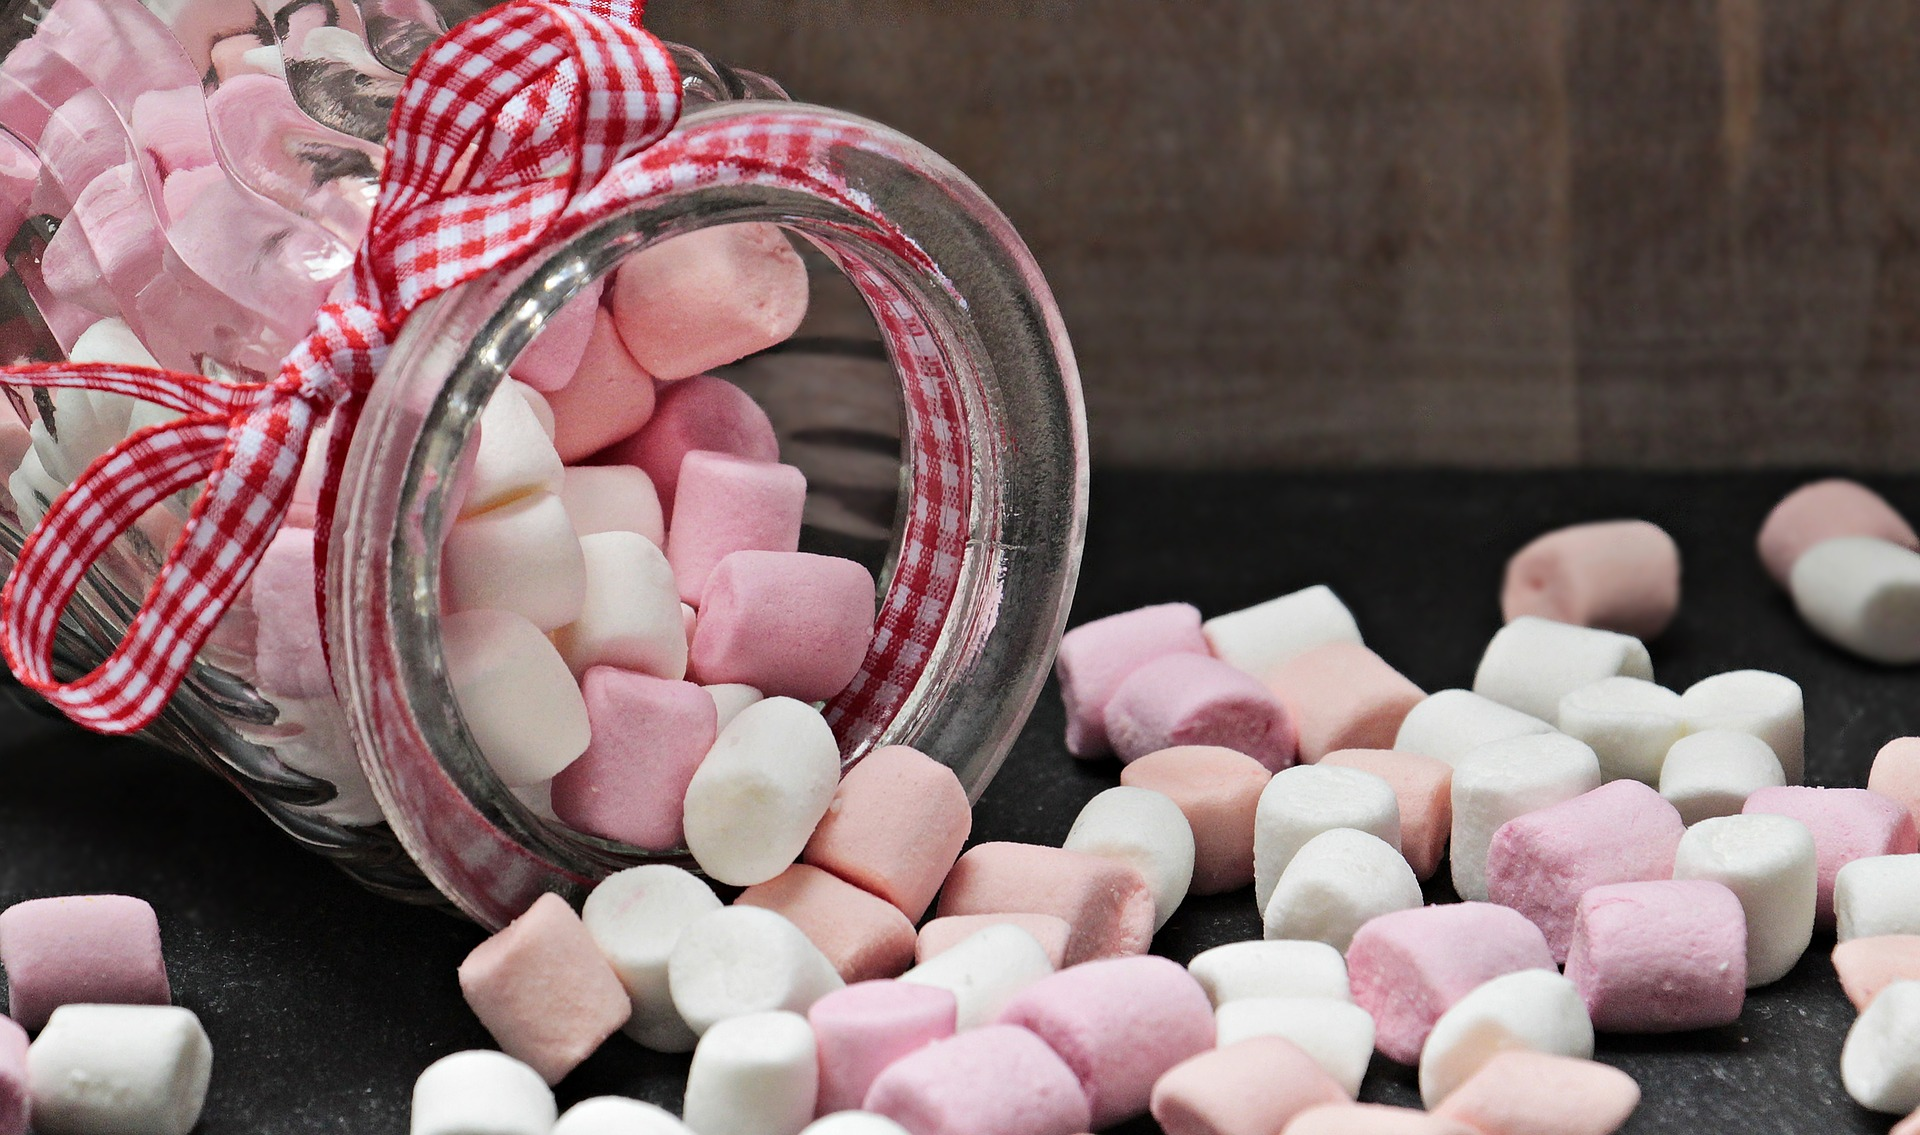 sugar not a stress reliever